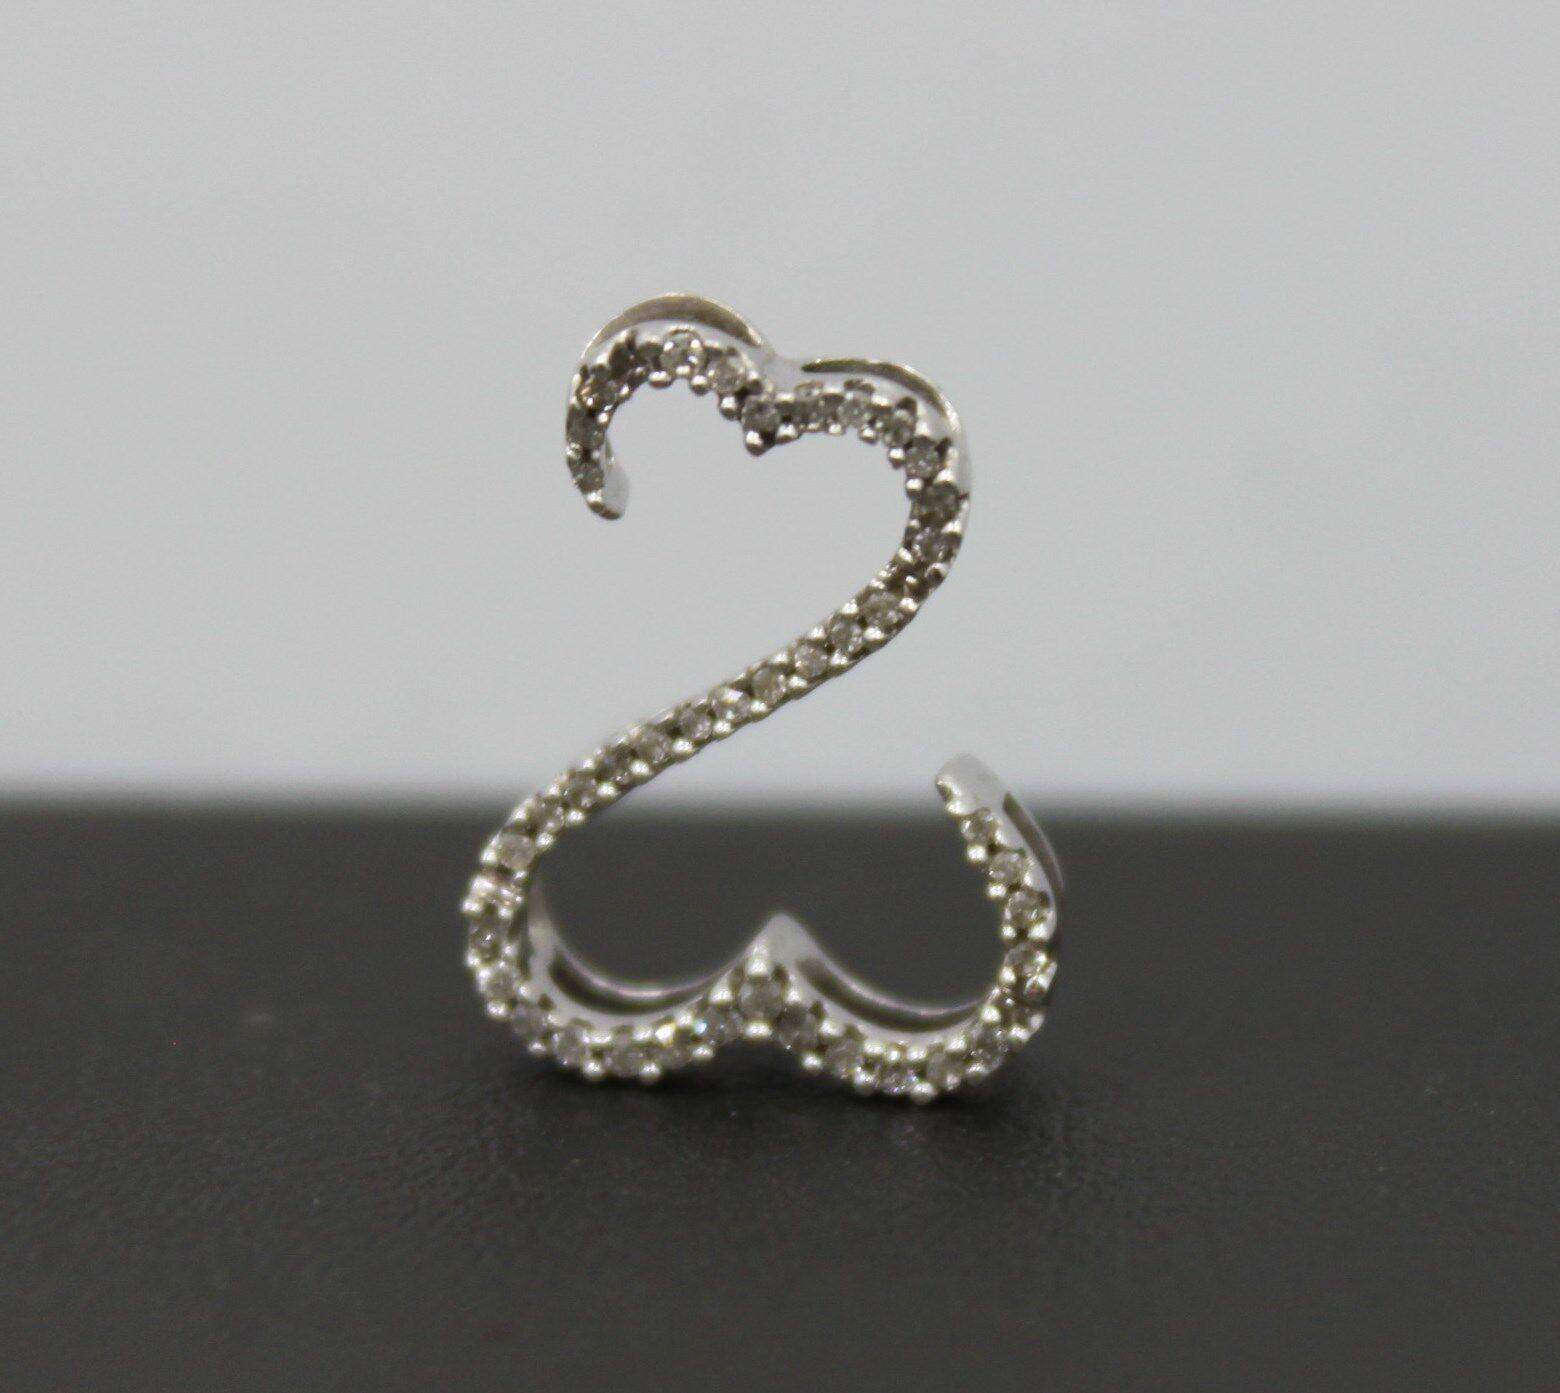 jane seymour 14k white gold open hearts diamond pendant 1. Black Bedroom Furniture Sets. Home Design Ideas